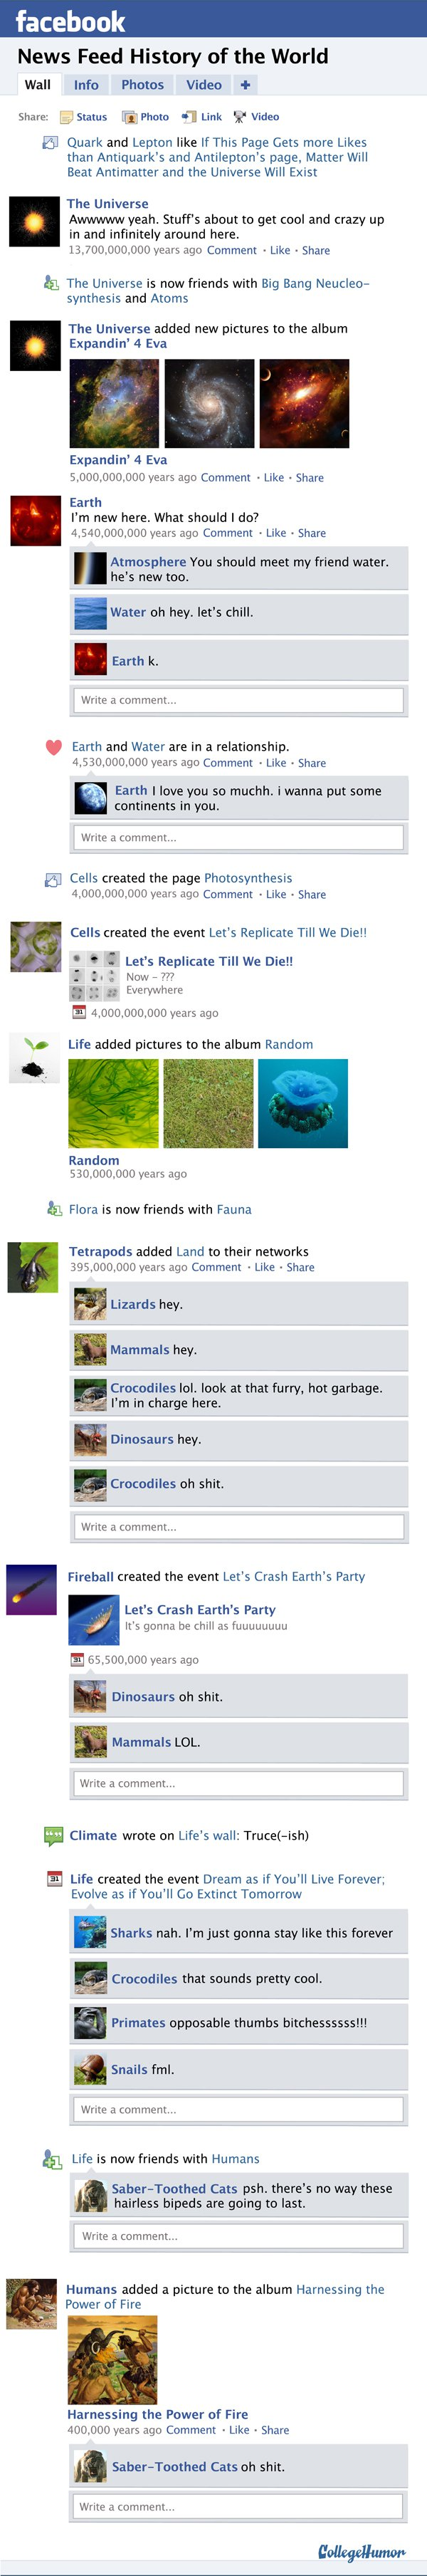 facebook-news-feed-history-of-the-world-big-bang-to-humans